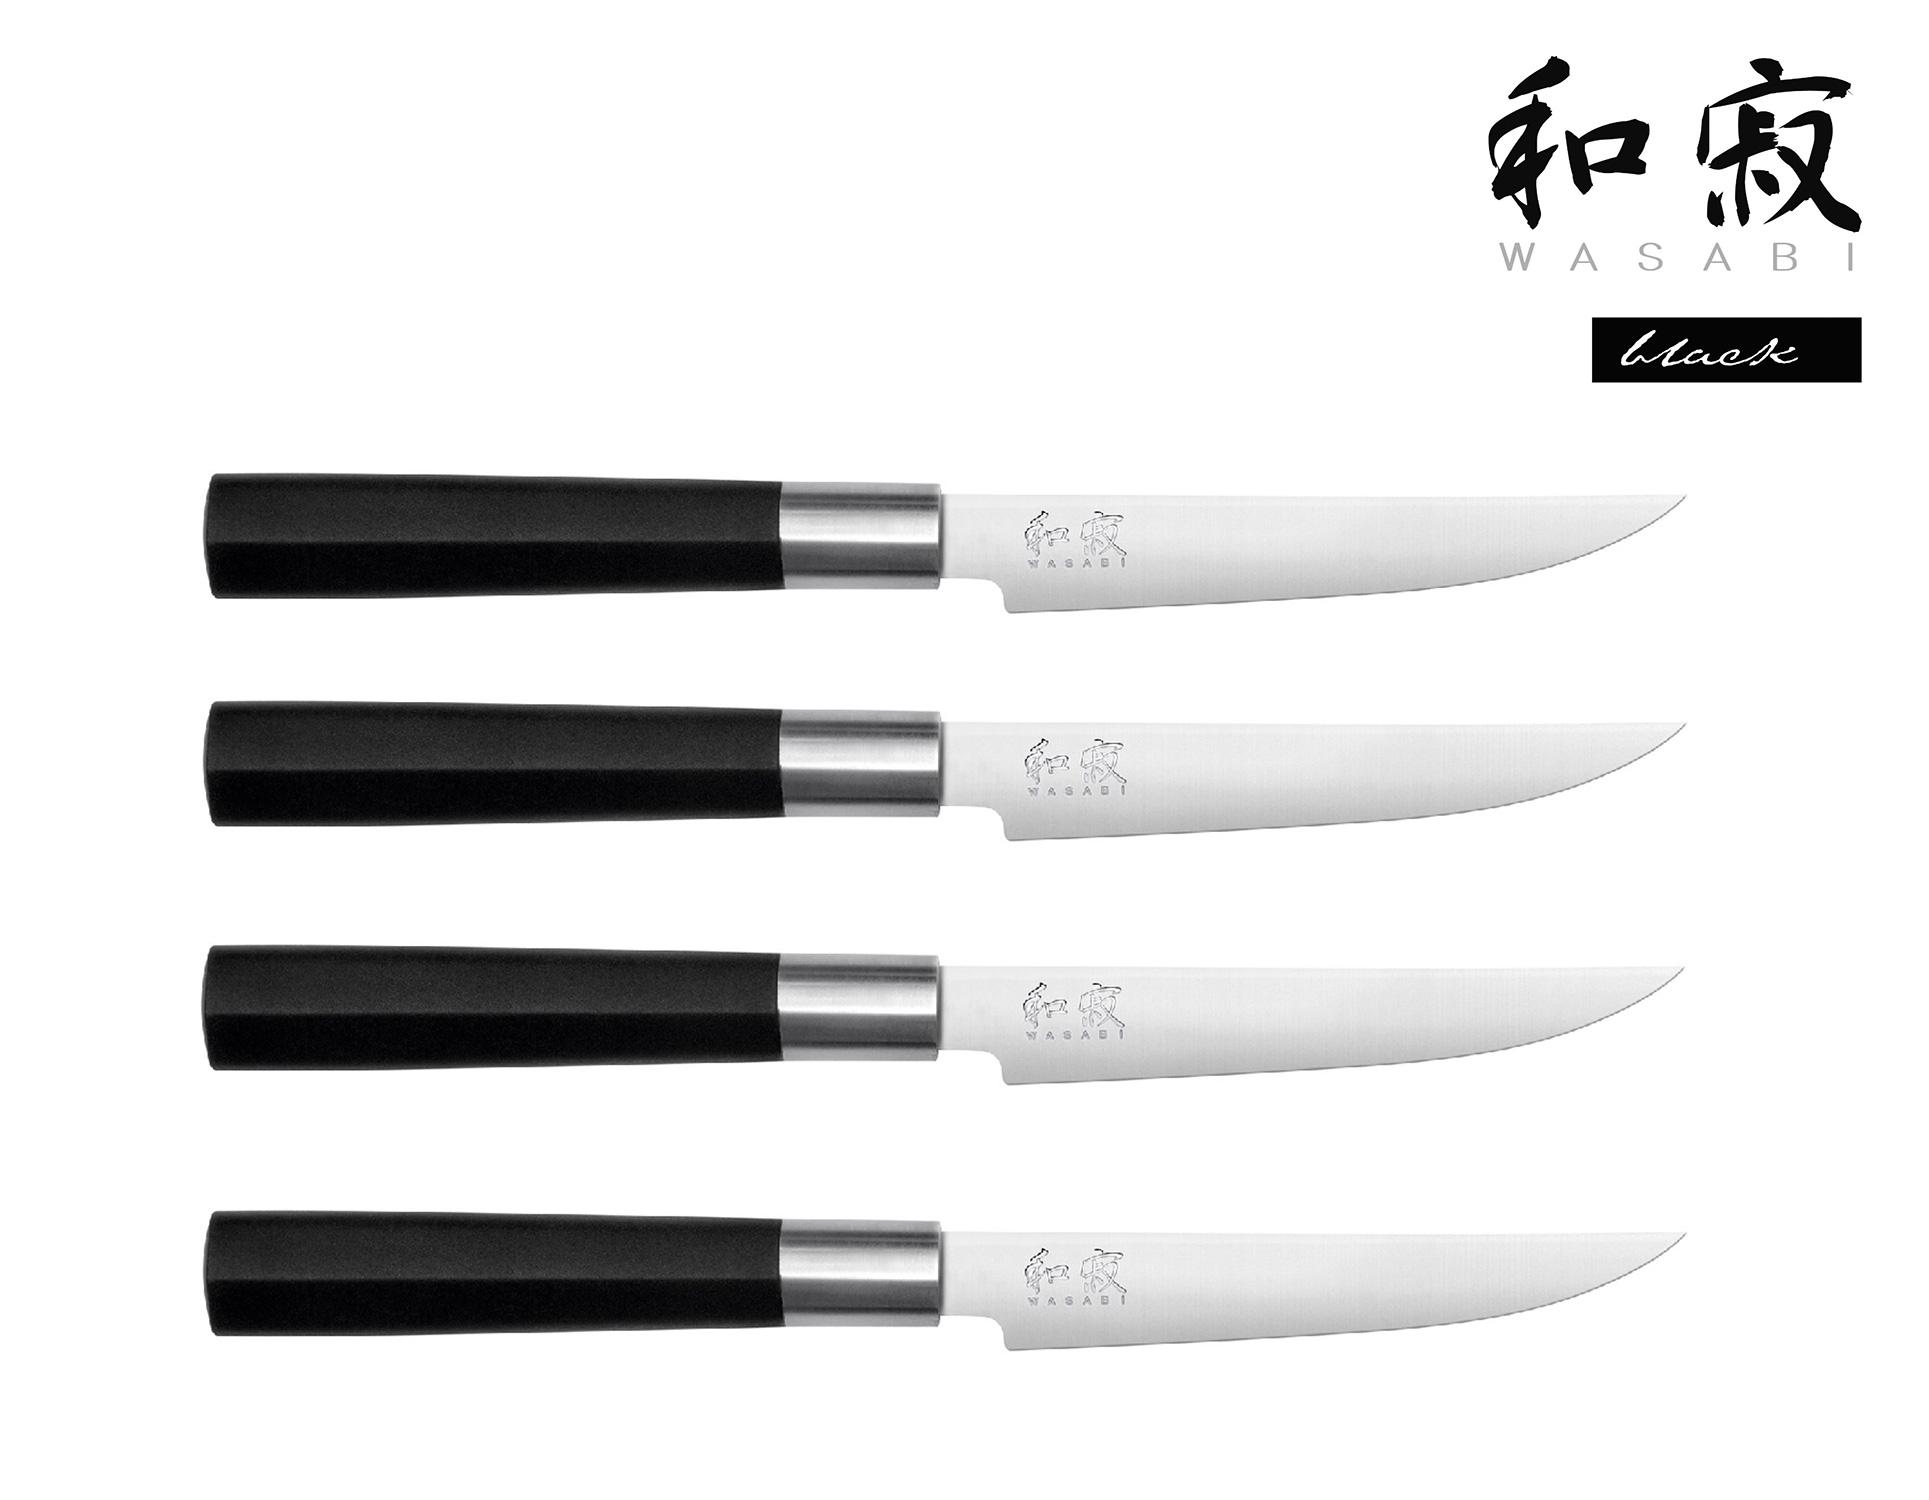 KAI Wasabi Black 4-er Set Steakmesser